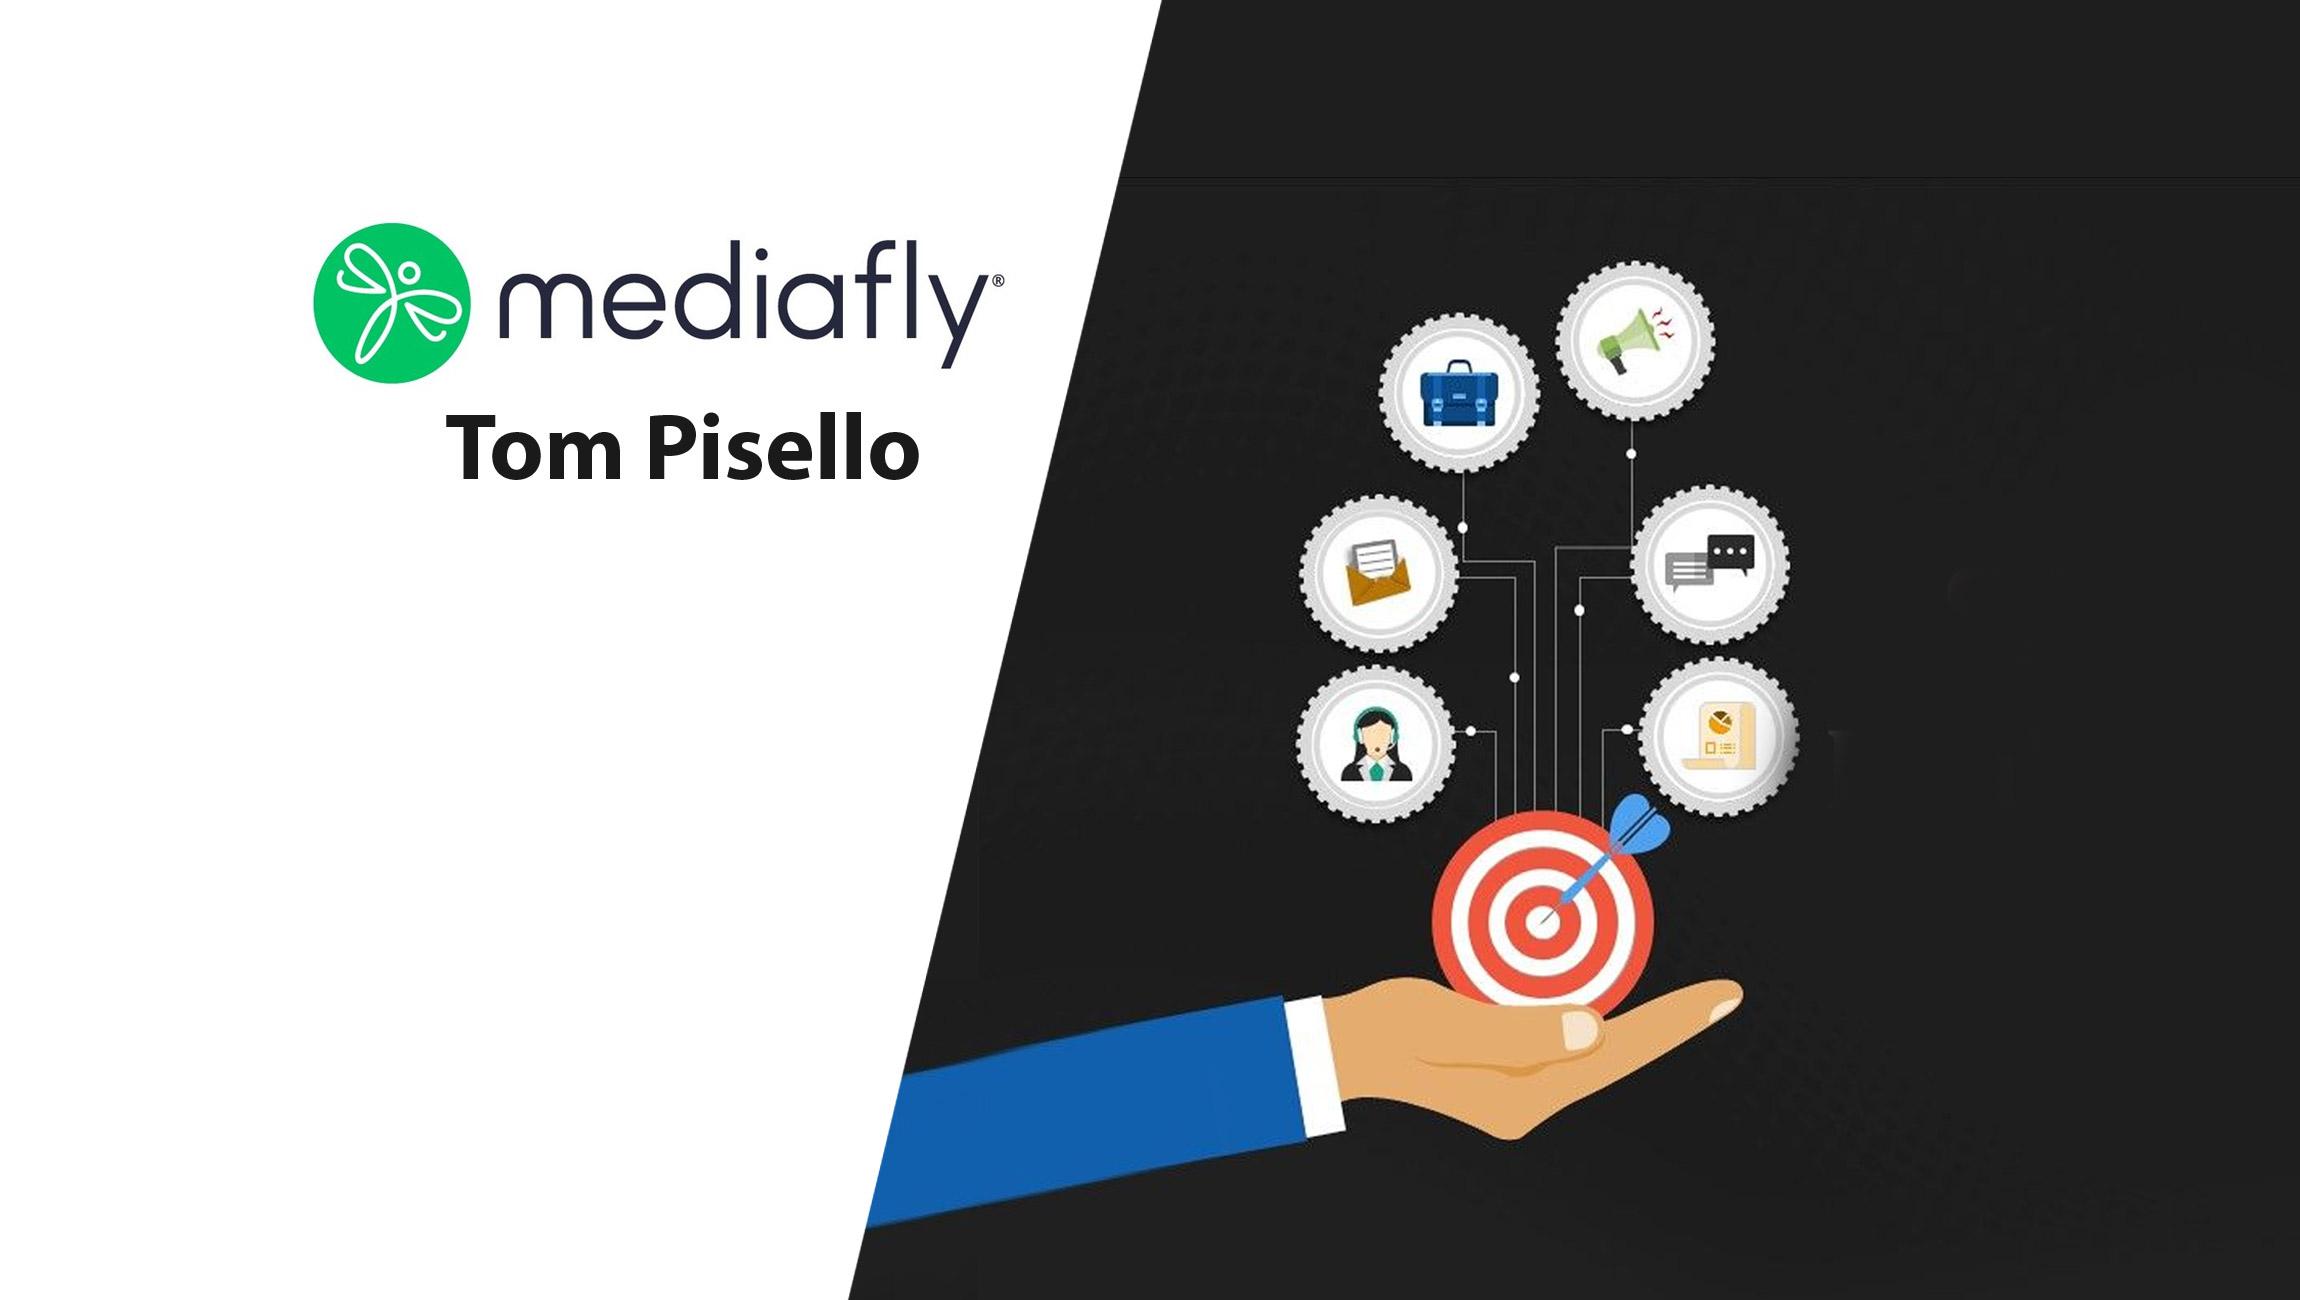 Tom-Pisello_Mediafly-SalesTechStar-guest-13August2021